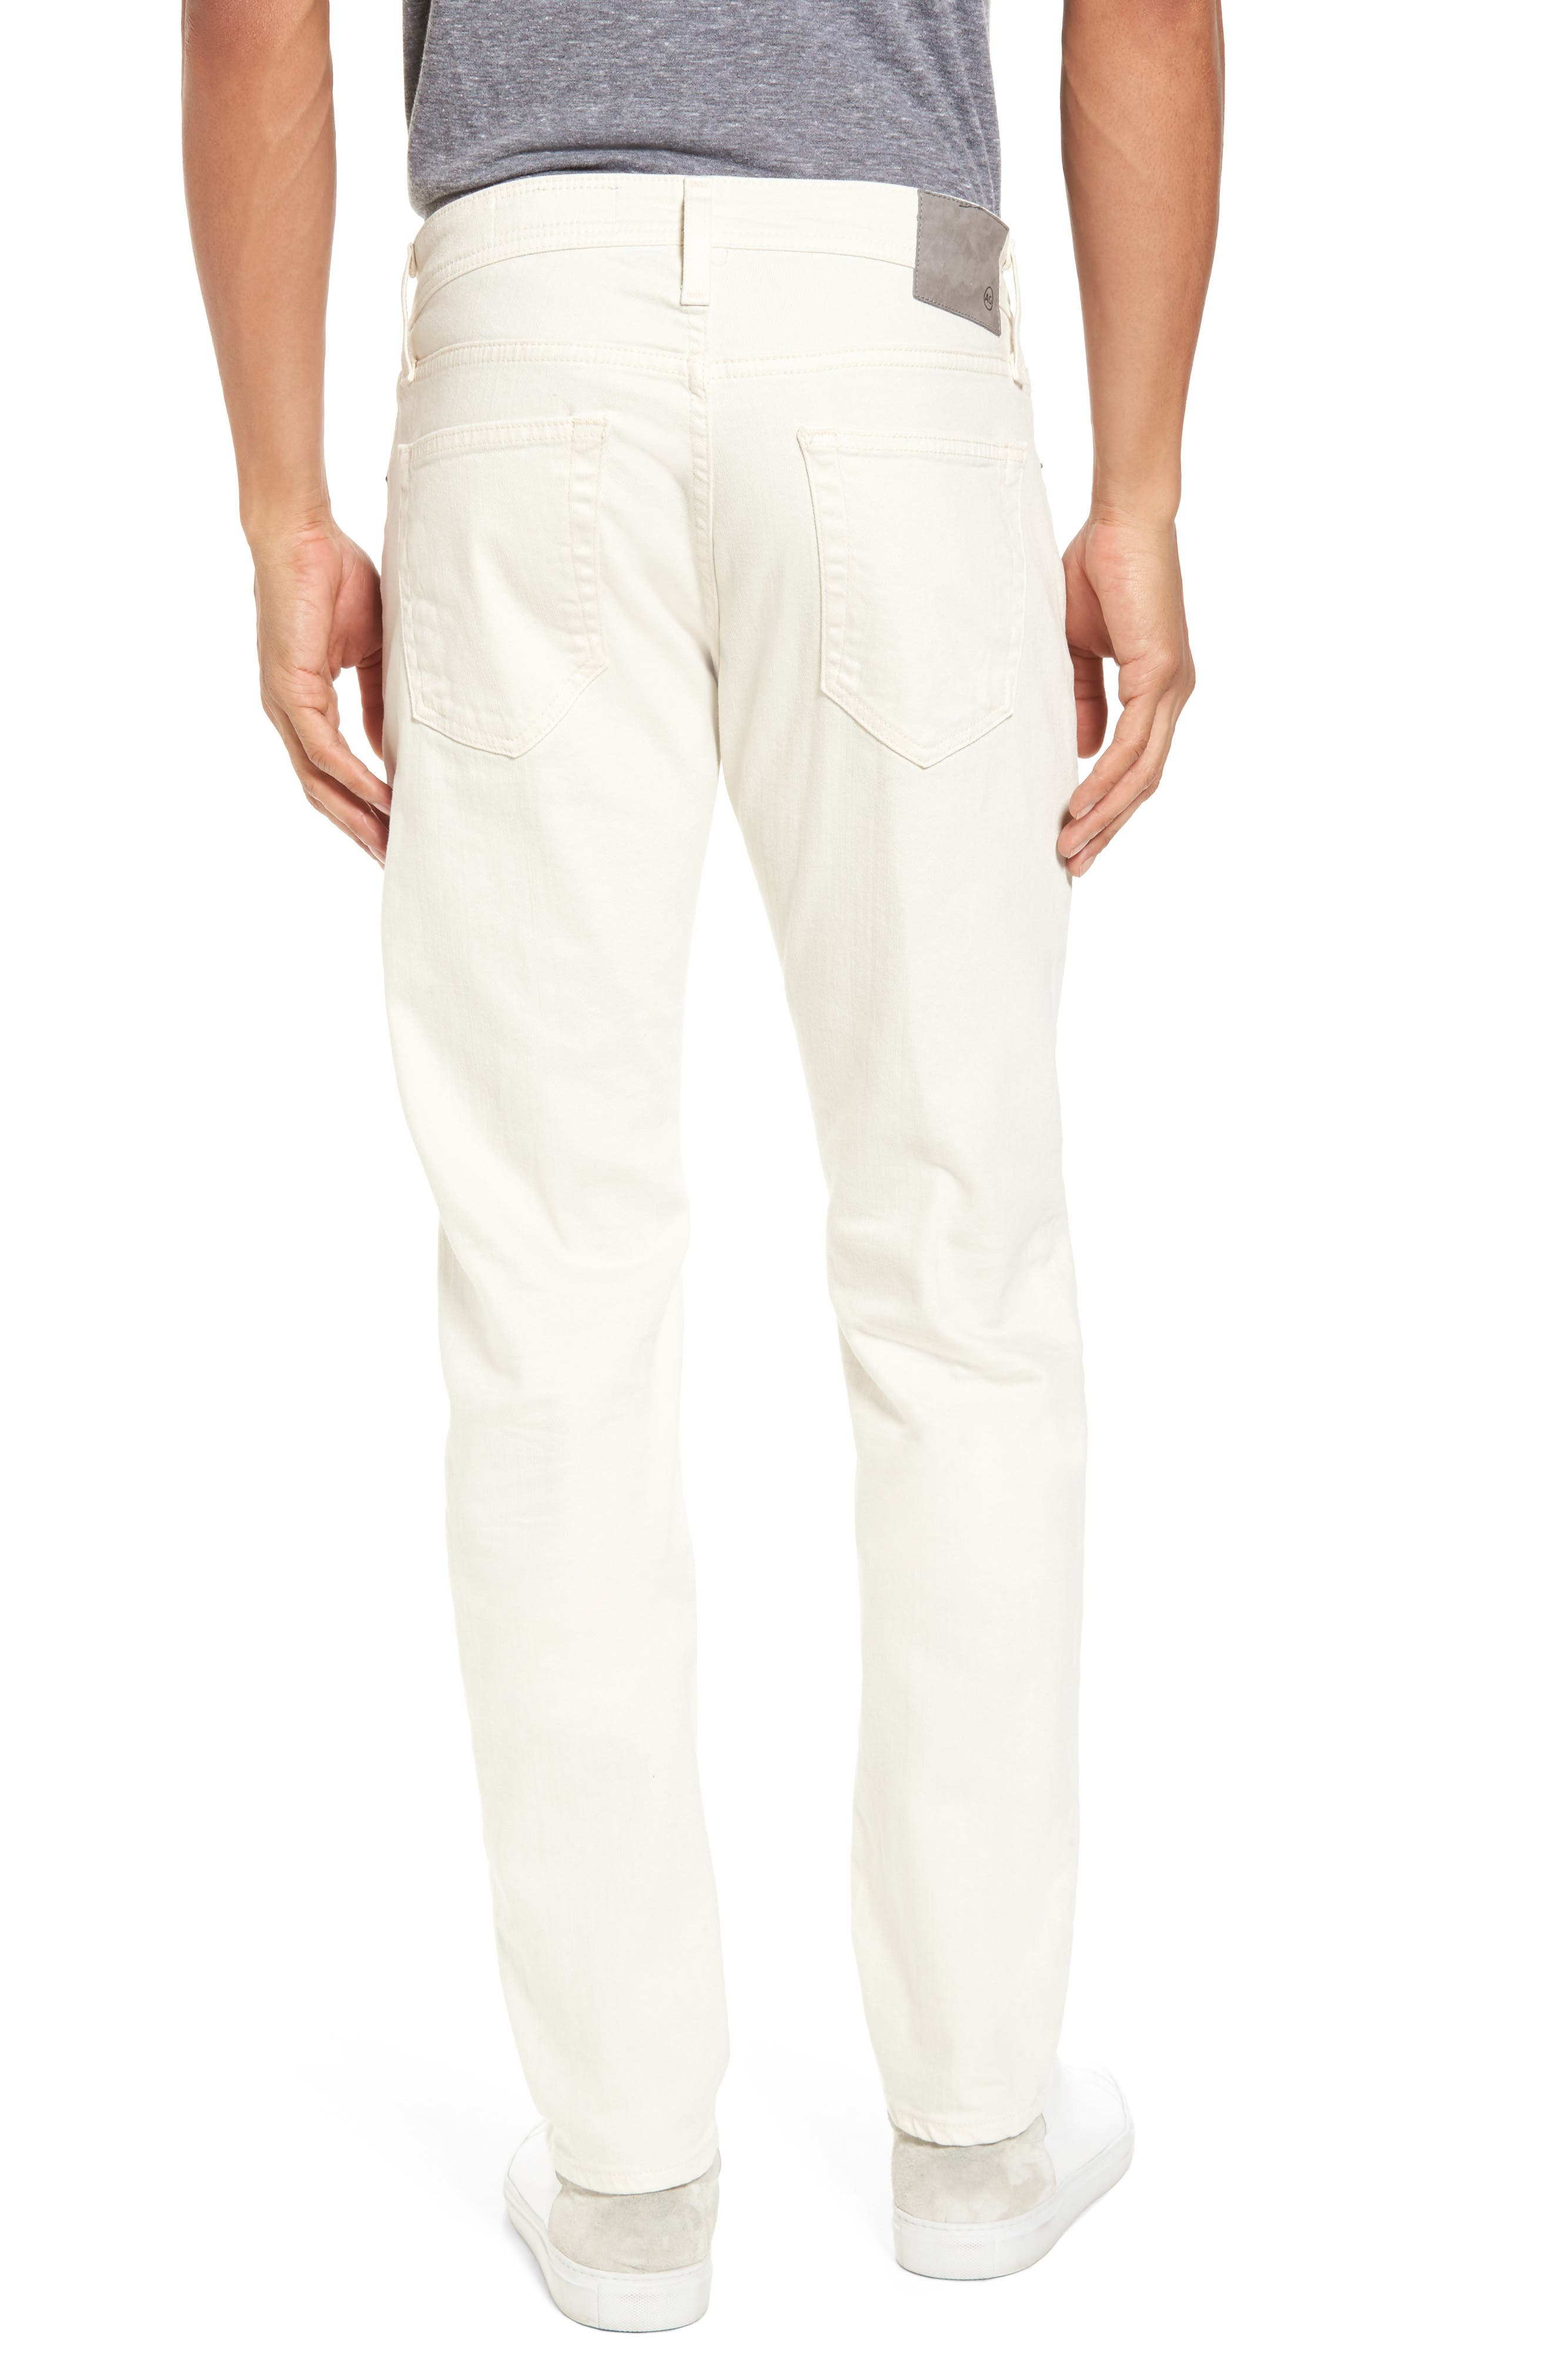 Tellis Modern Slim Twill Pants,                             Alternate thumbnail 2, color,                             020